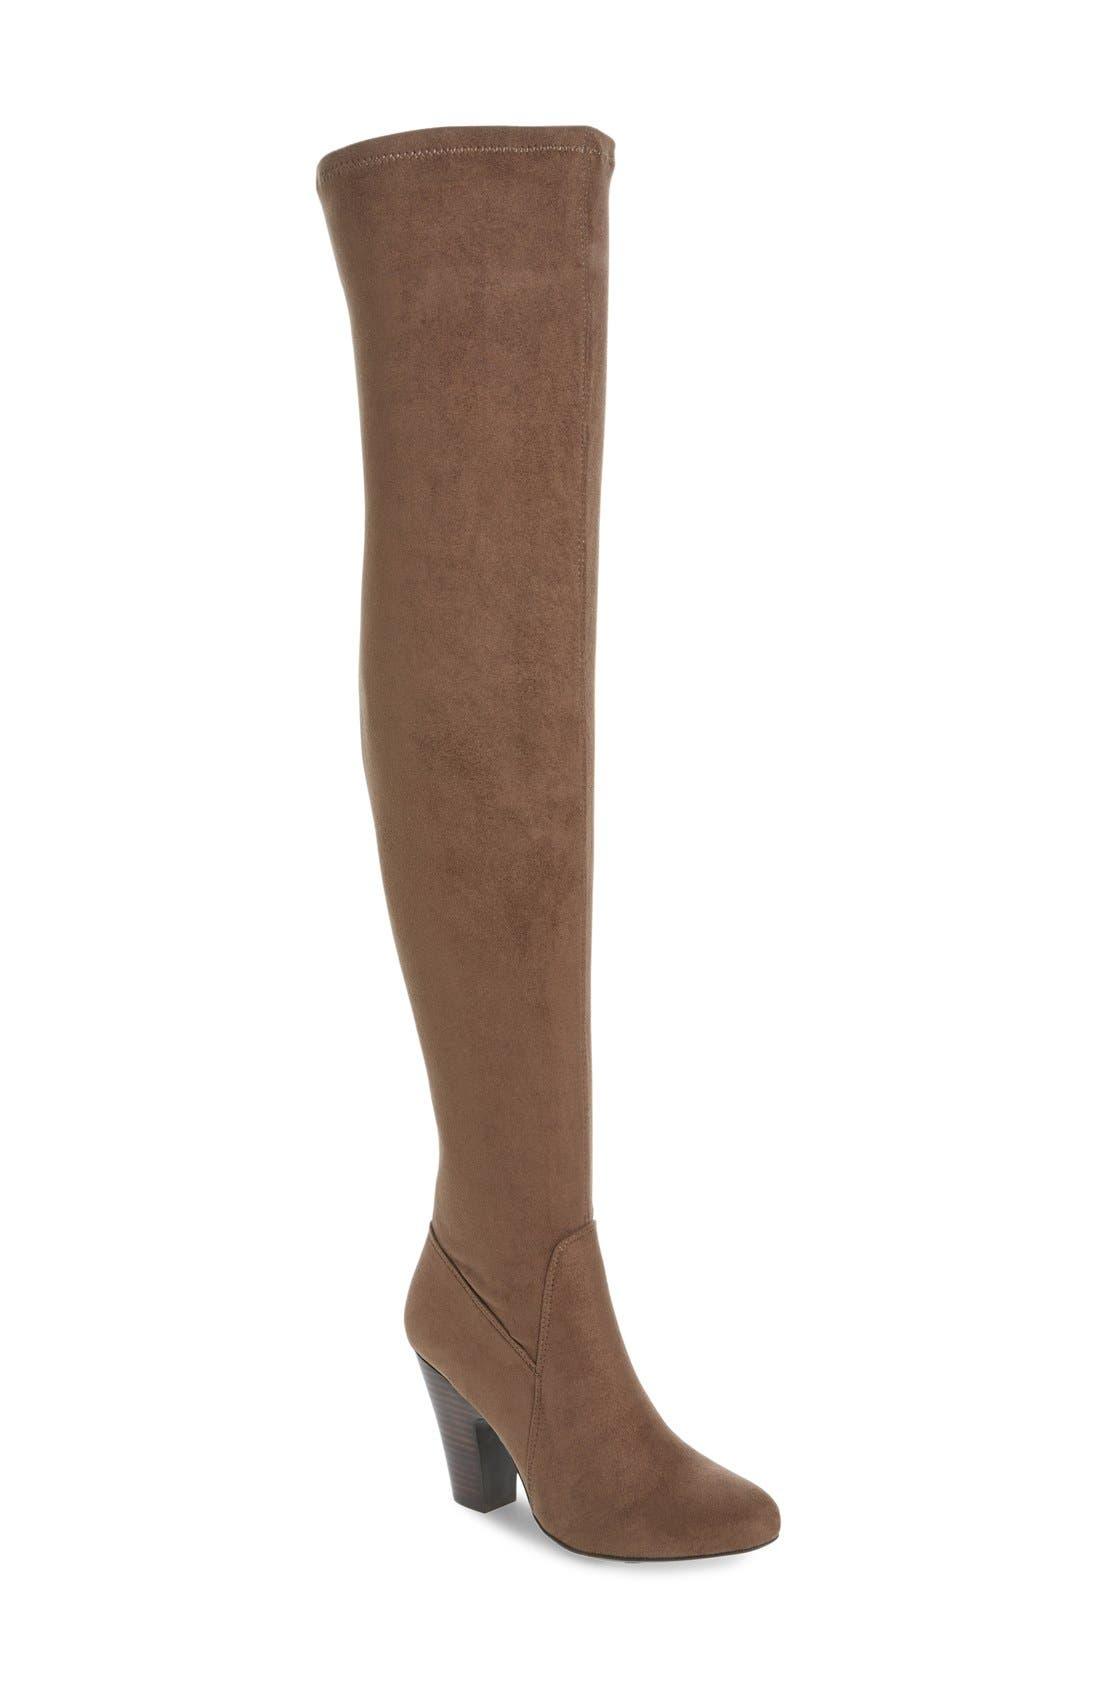 Alternate Image 1 Selected - MIA Emelia Thigh High Boot (Women)